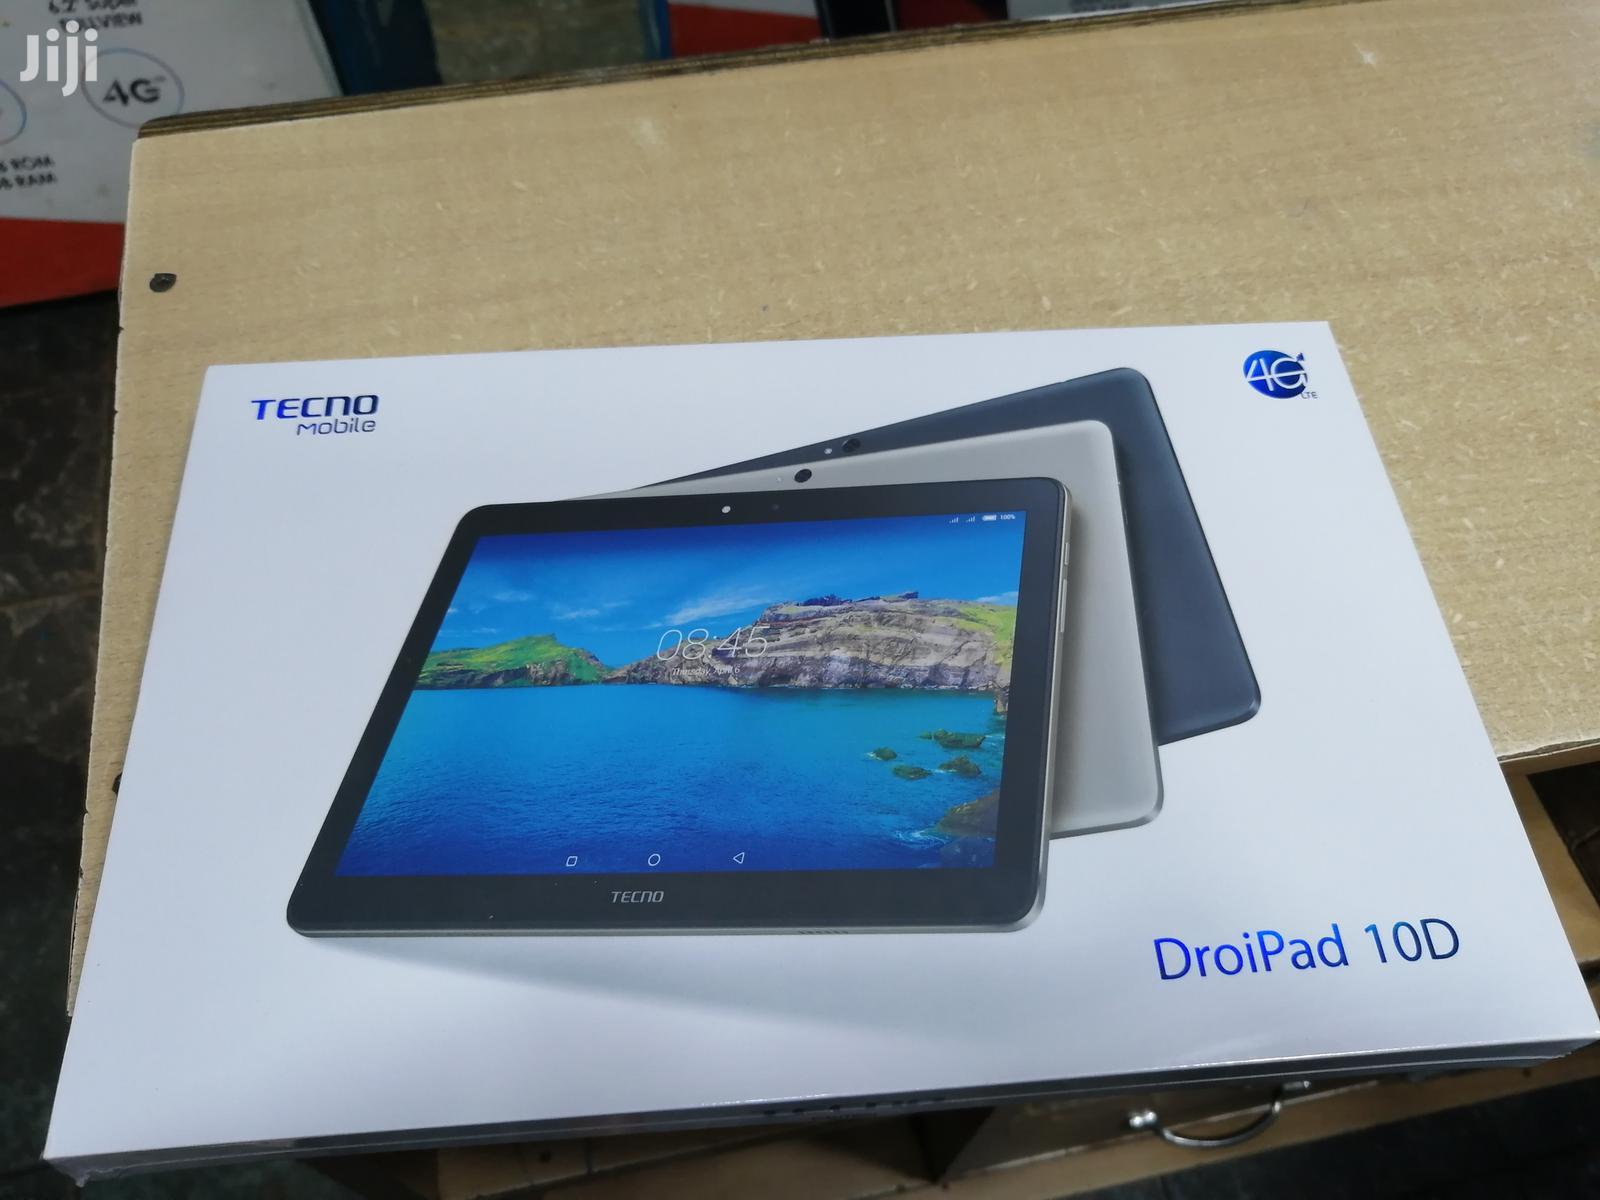 Archive: New Tecno DroidPad 10 Pro II 16 GB Gray